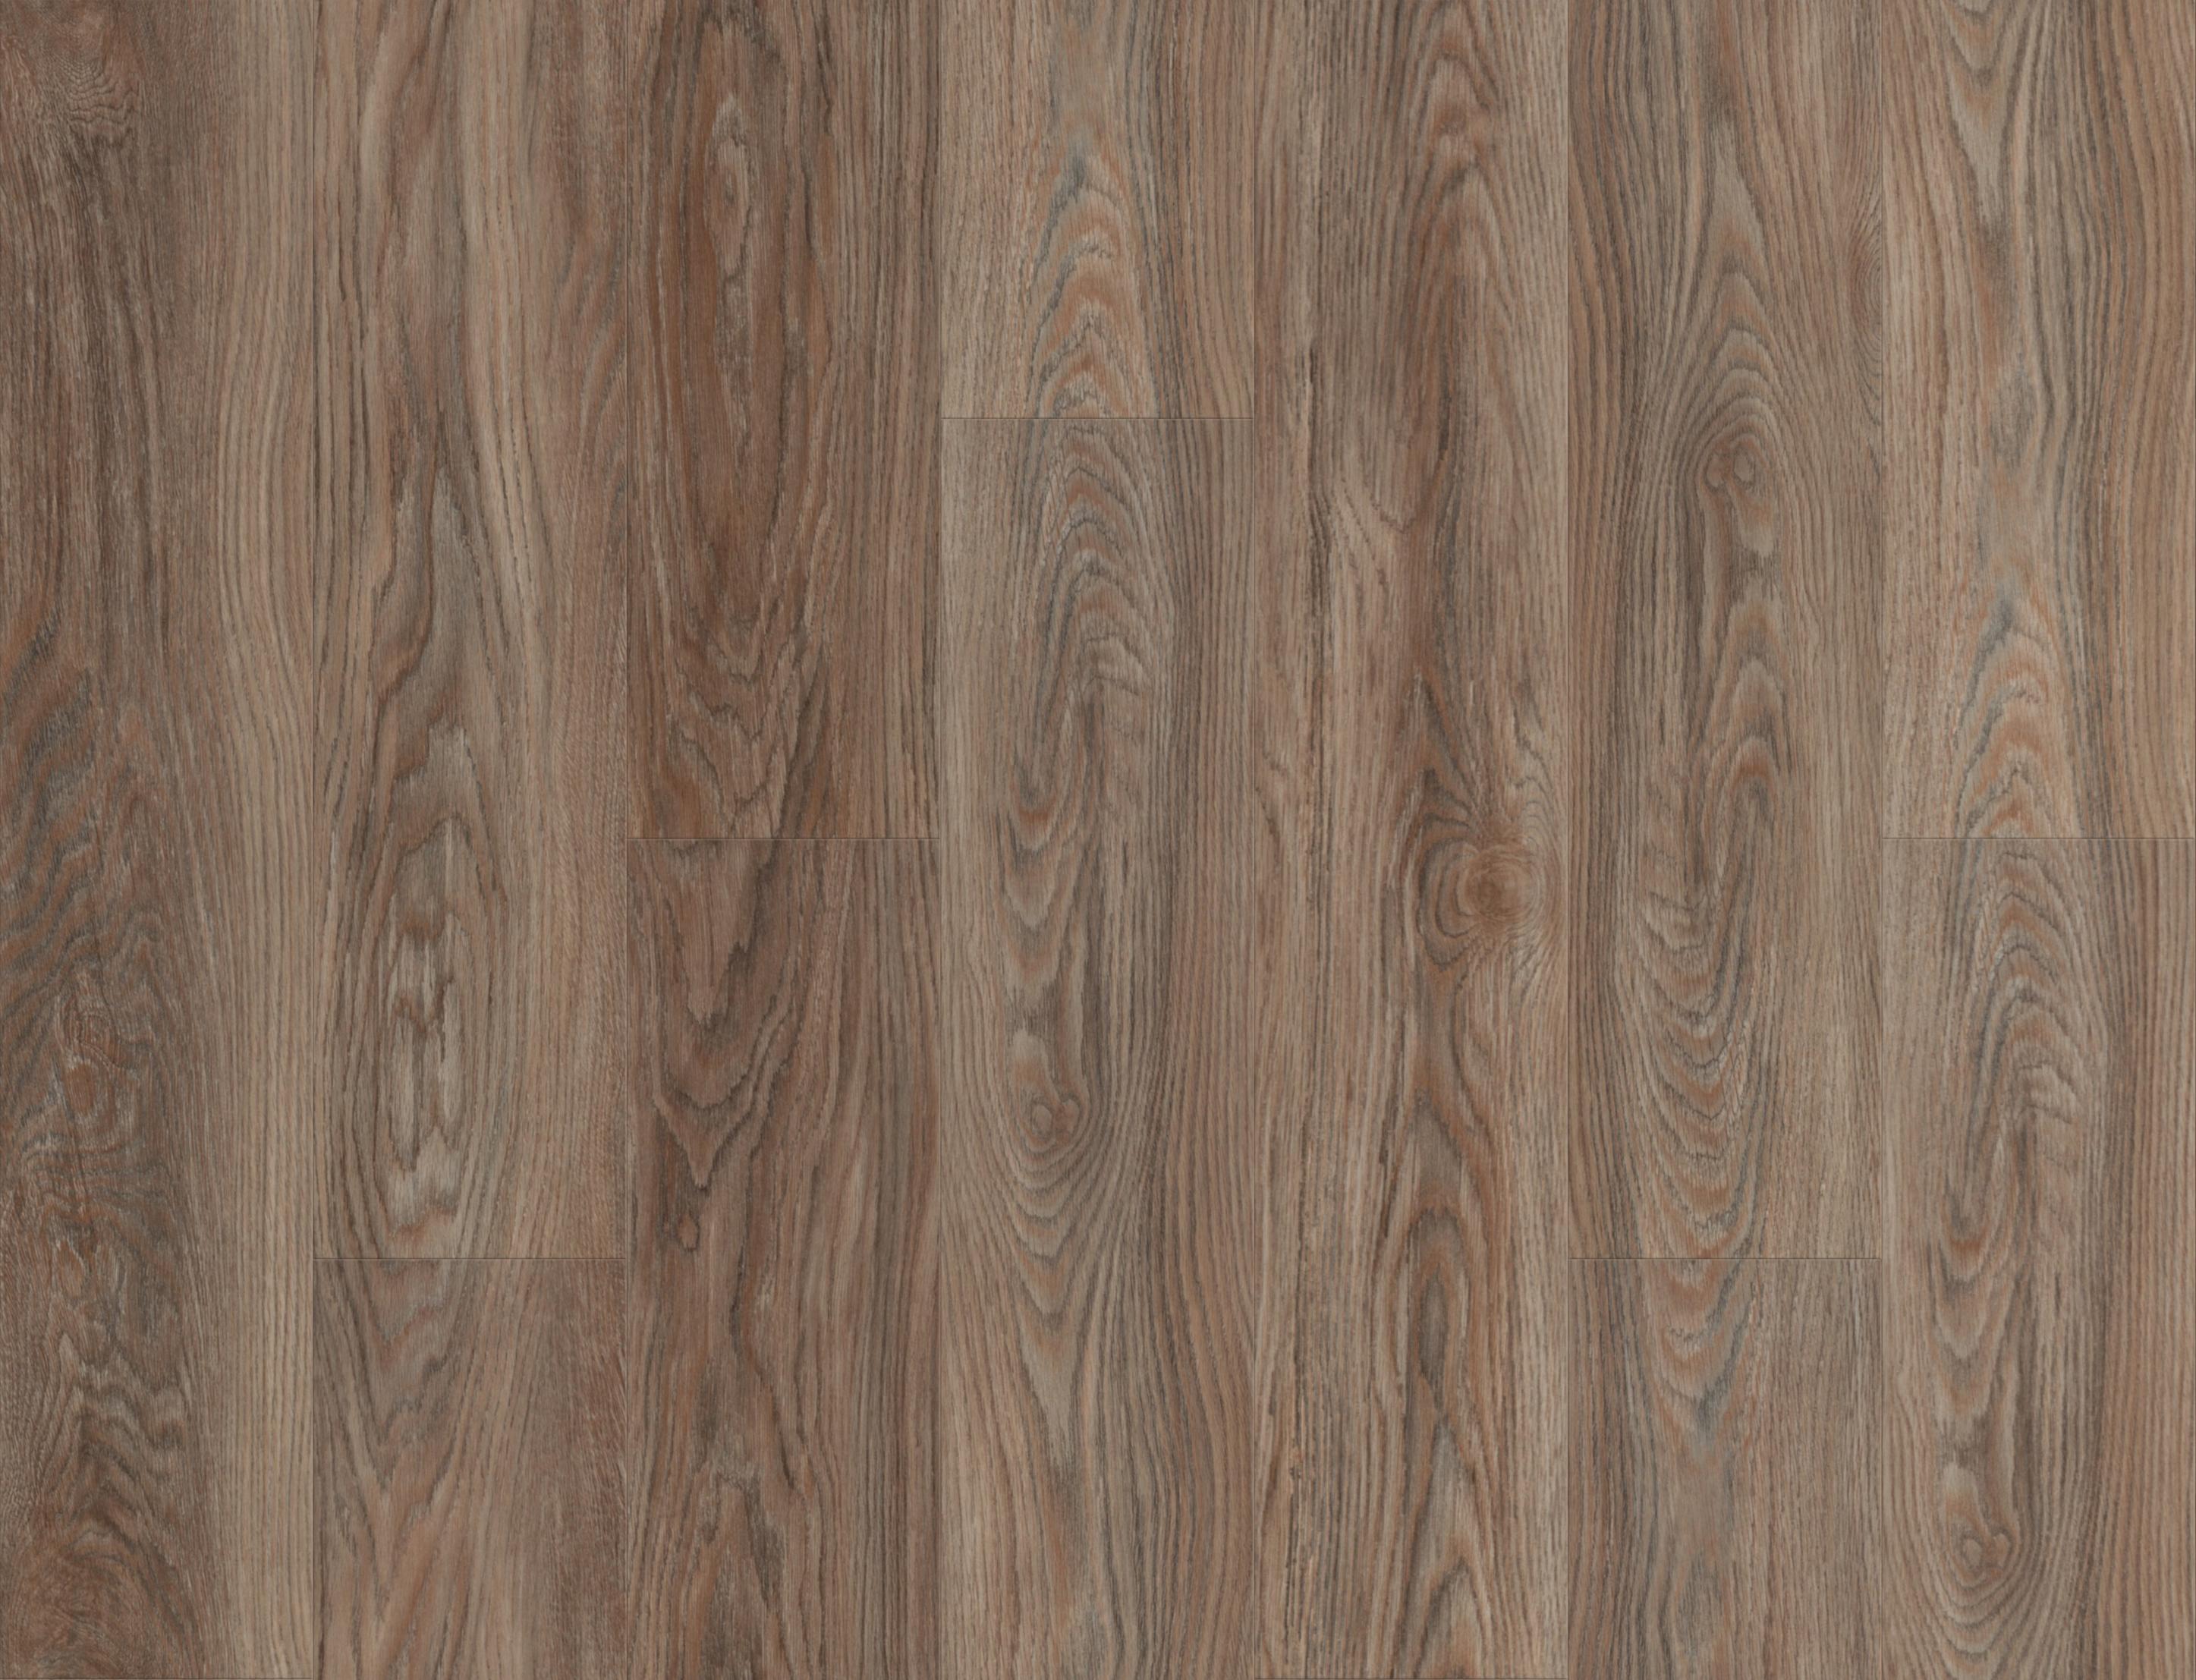 Weathered Wood Laminate Flooring Alyssamyers